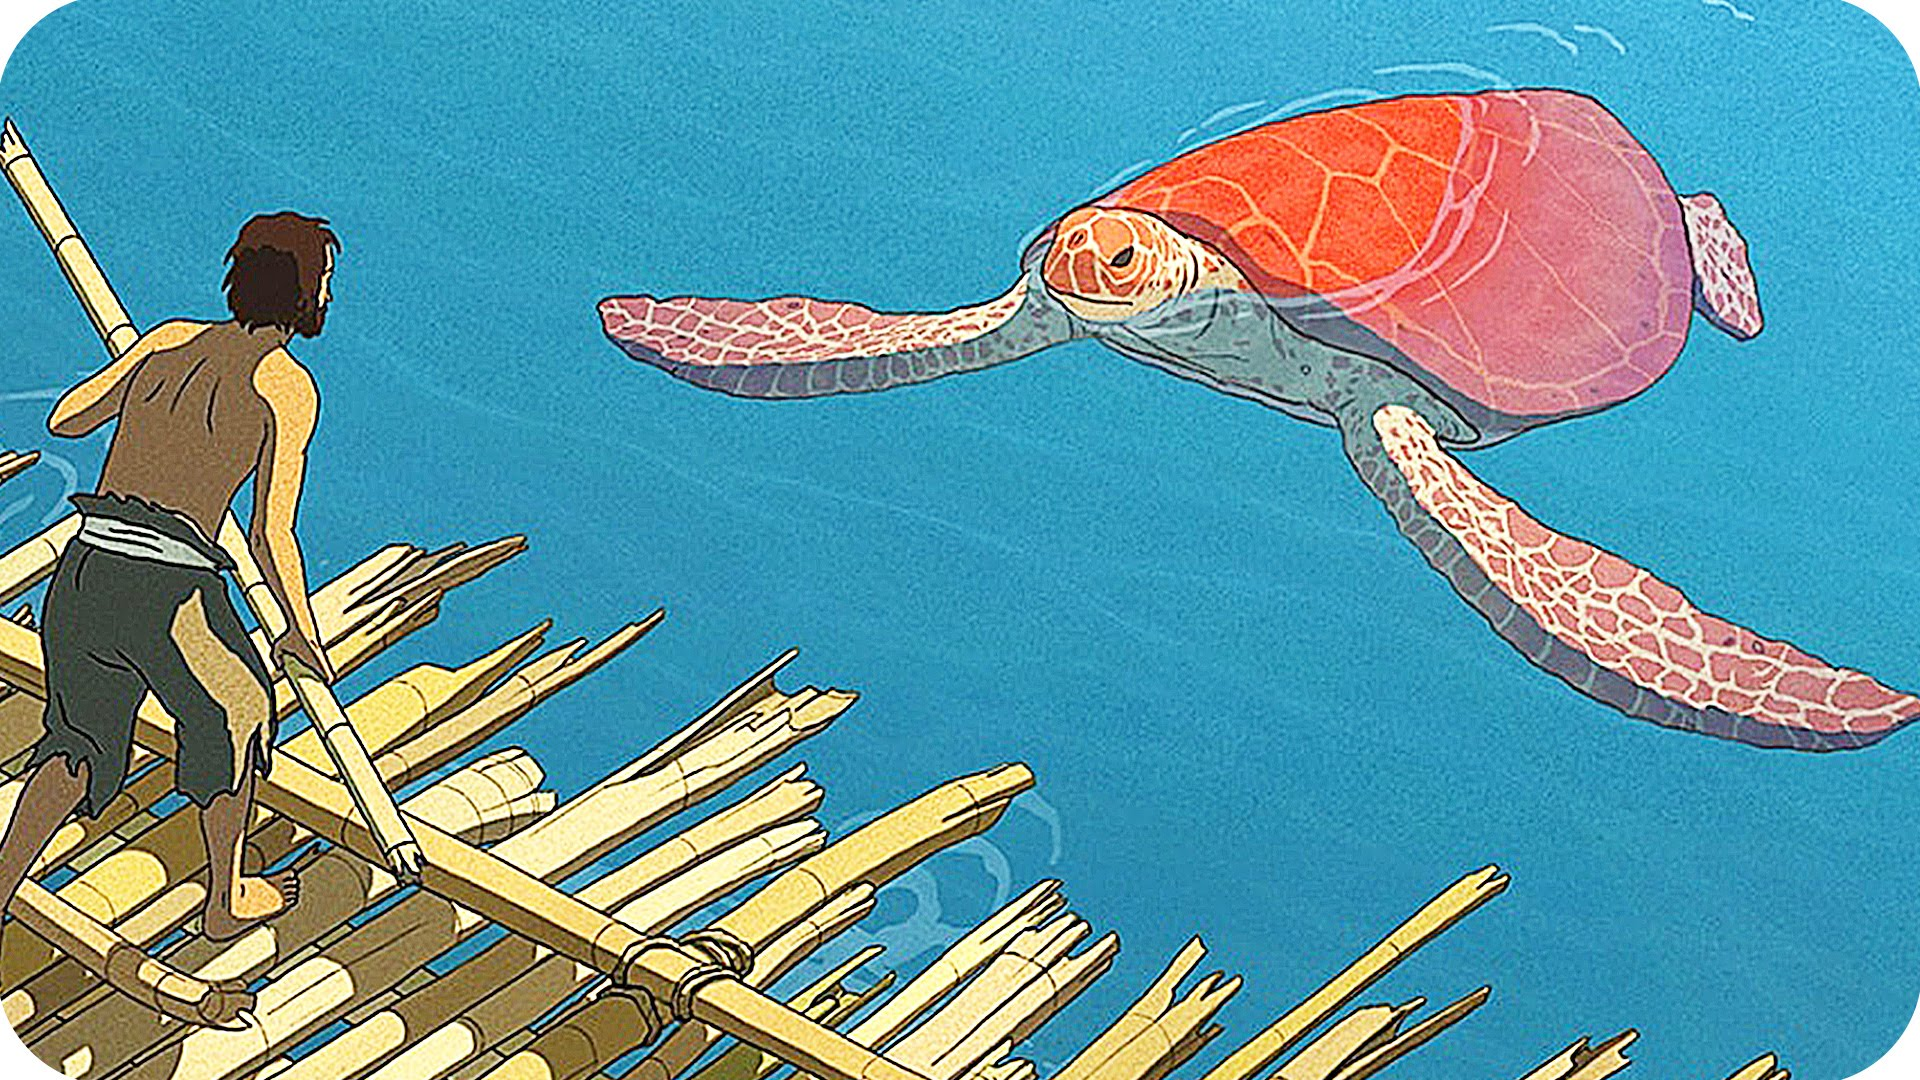 The Red Turtle Upstate Films Ltd